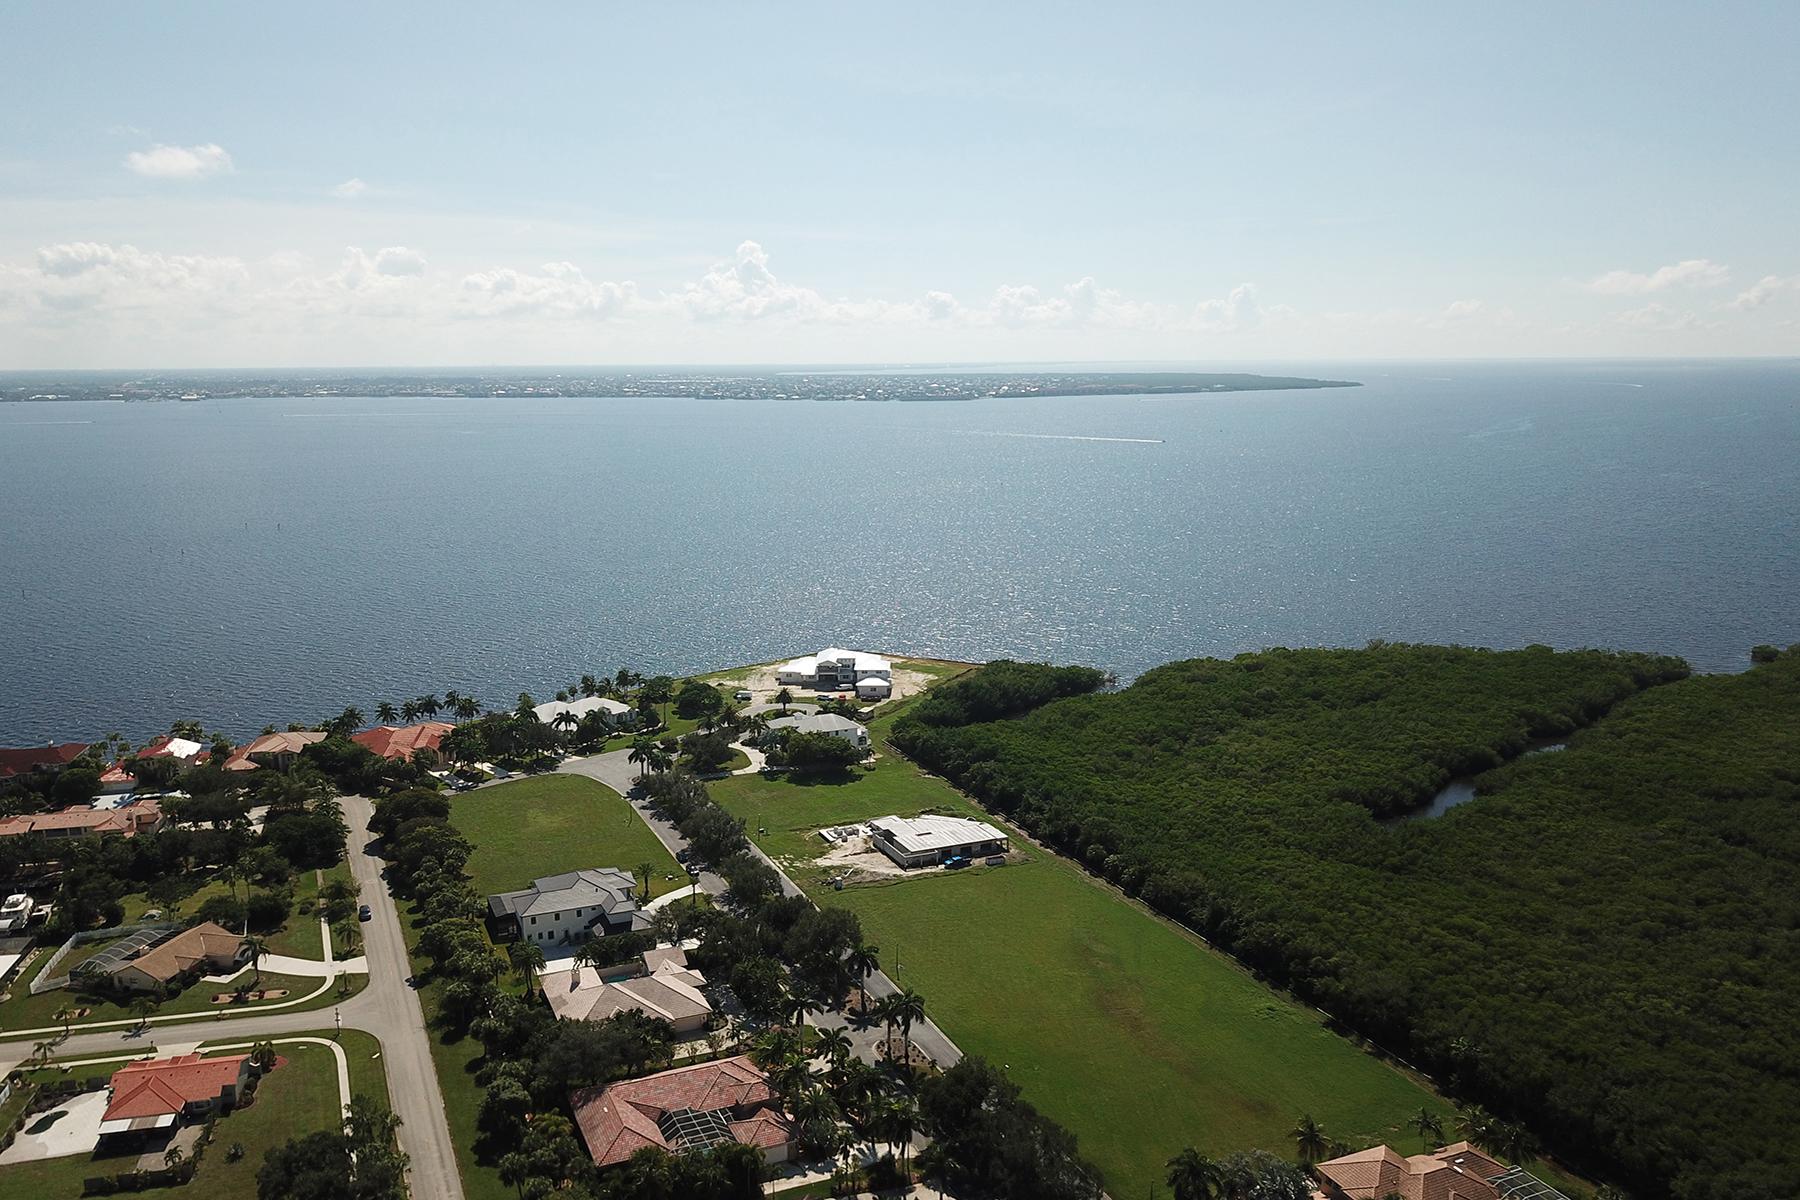 Land for Sale at GRASSY POINT 21441 Harborside Blvd Port Charlotte, Florida 33952 United States